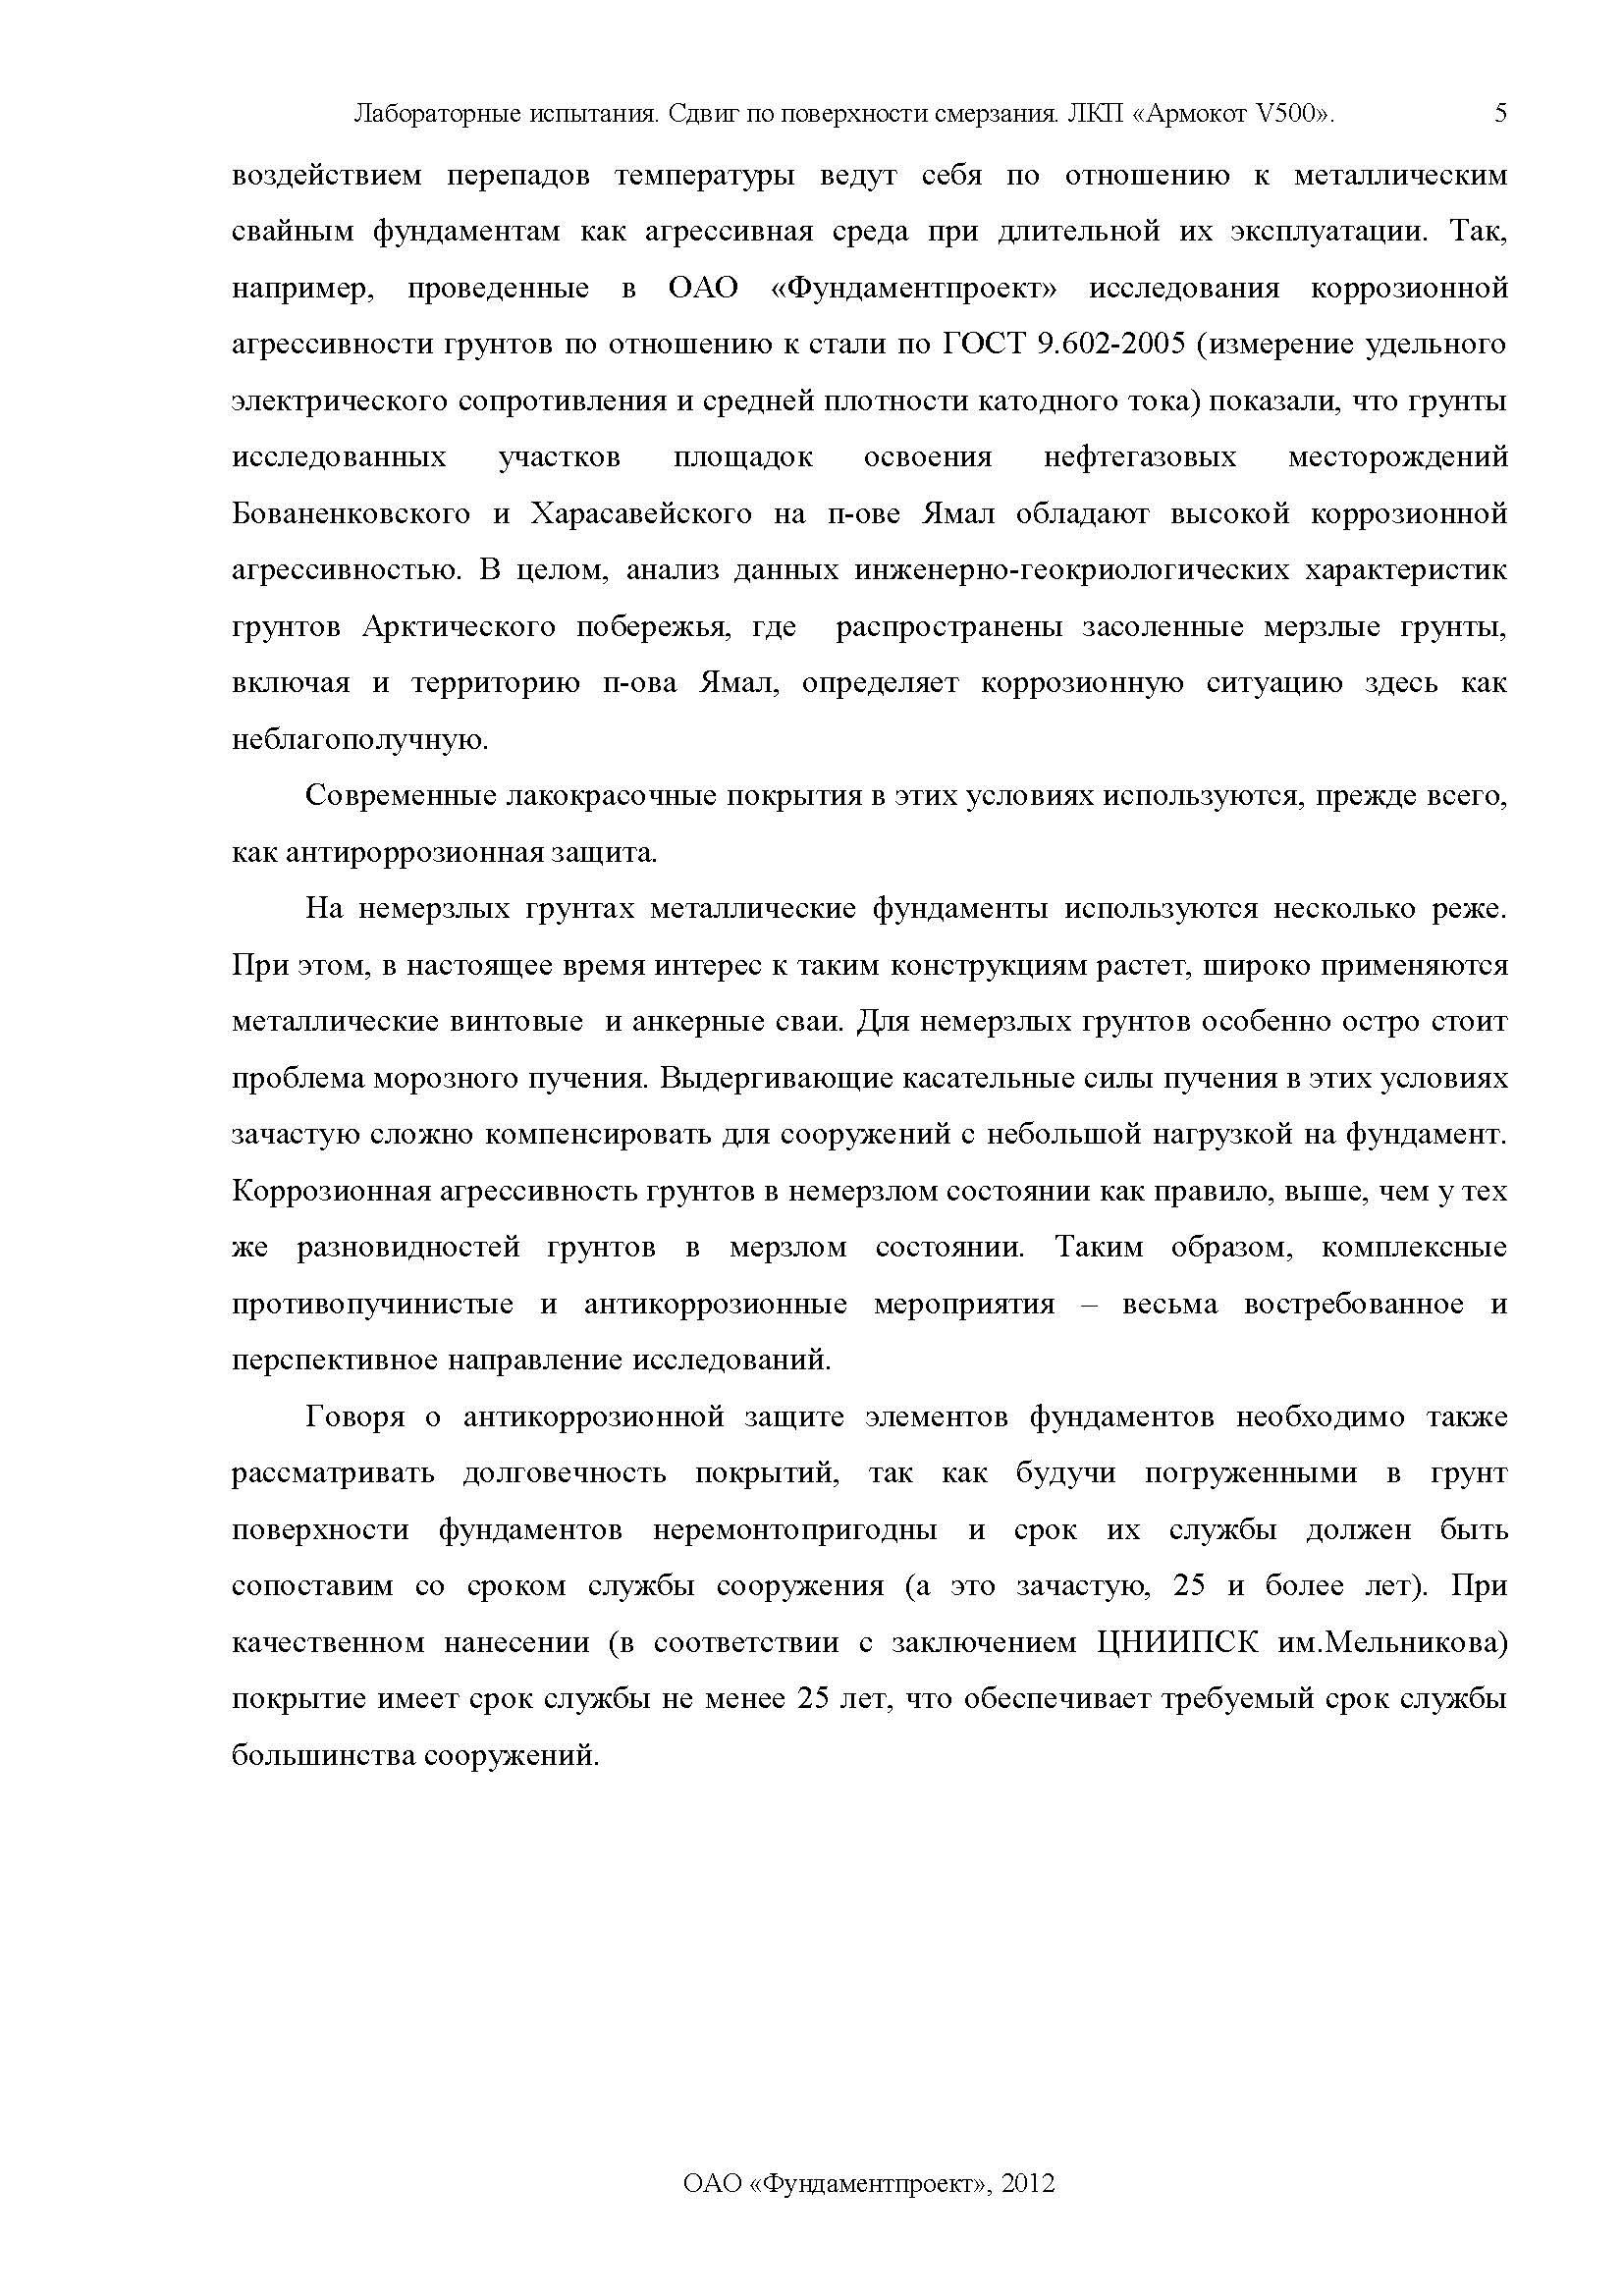 Отчет по сваям Армокот V500 Фундаментпроект_Страница_05